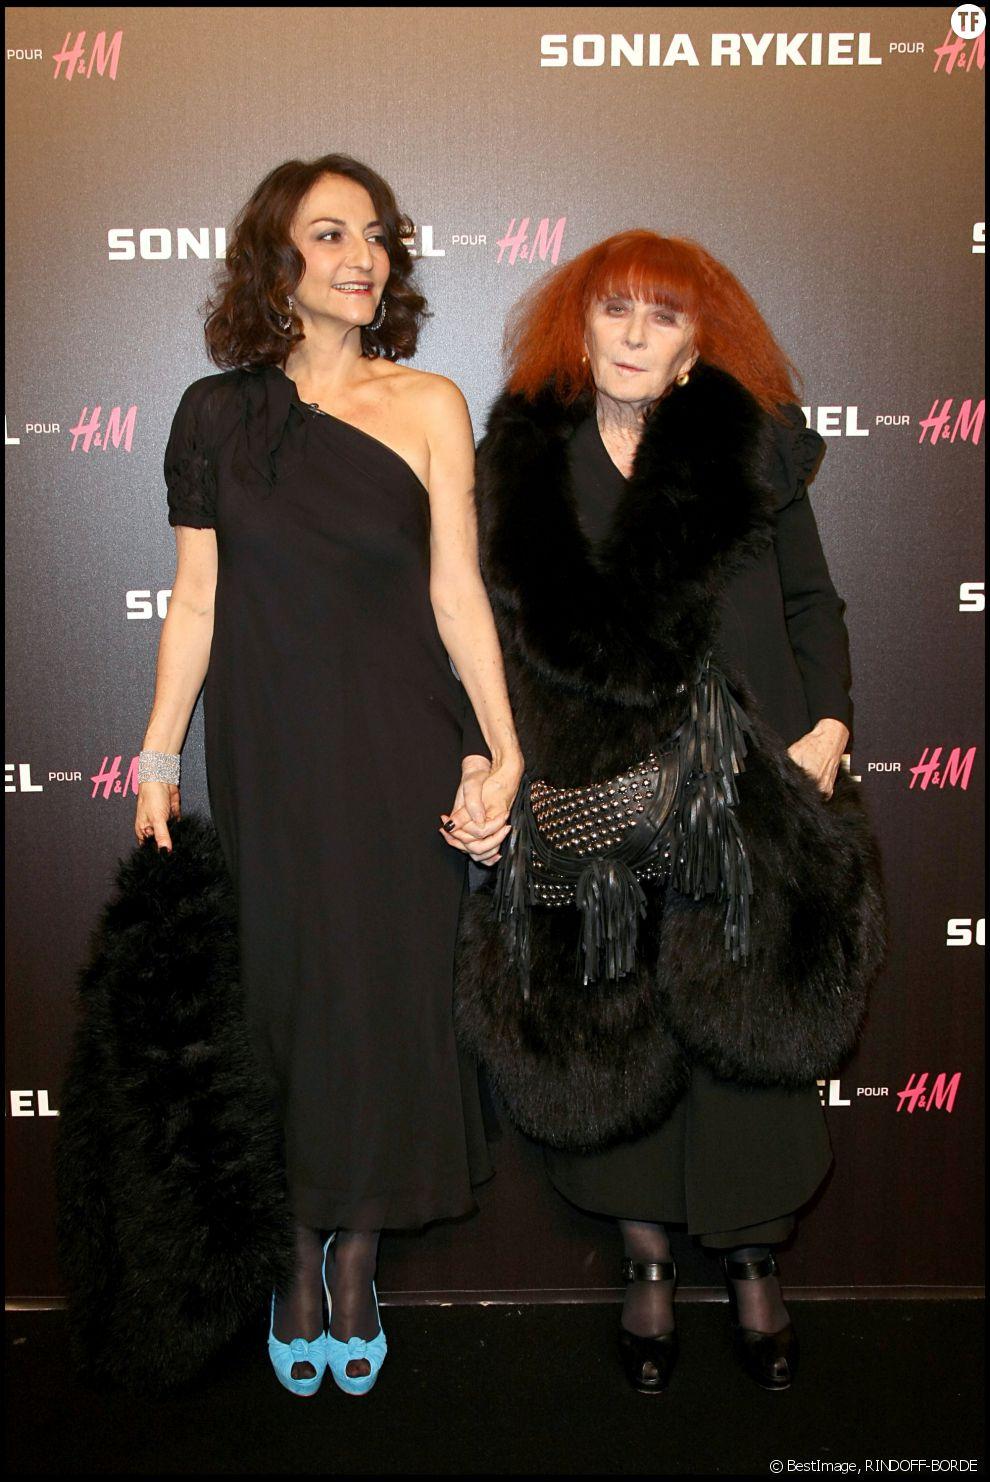 Sonia Rykiel et sa fille Nathalie